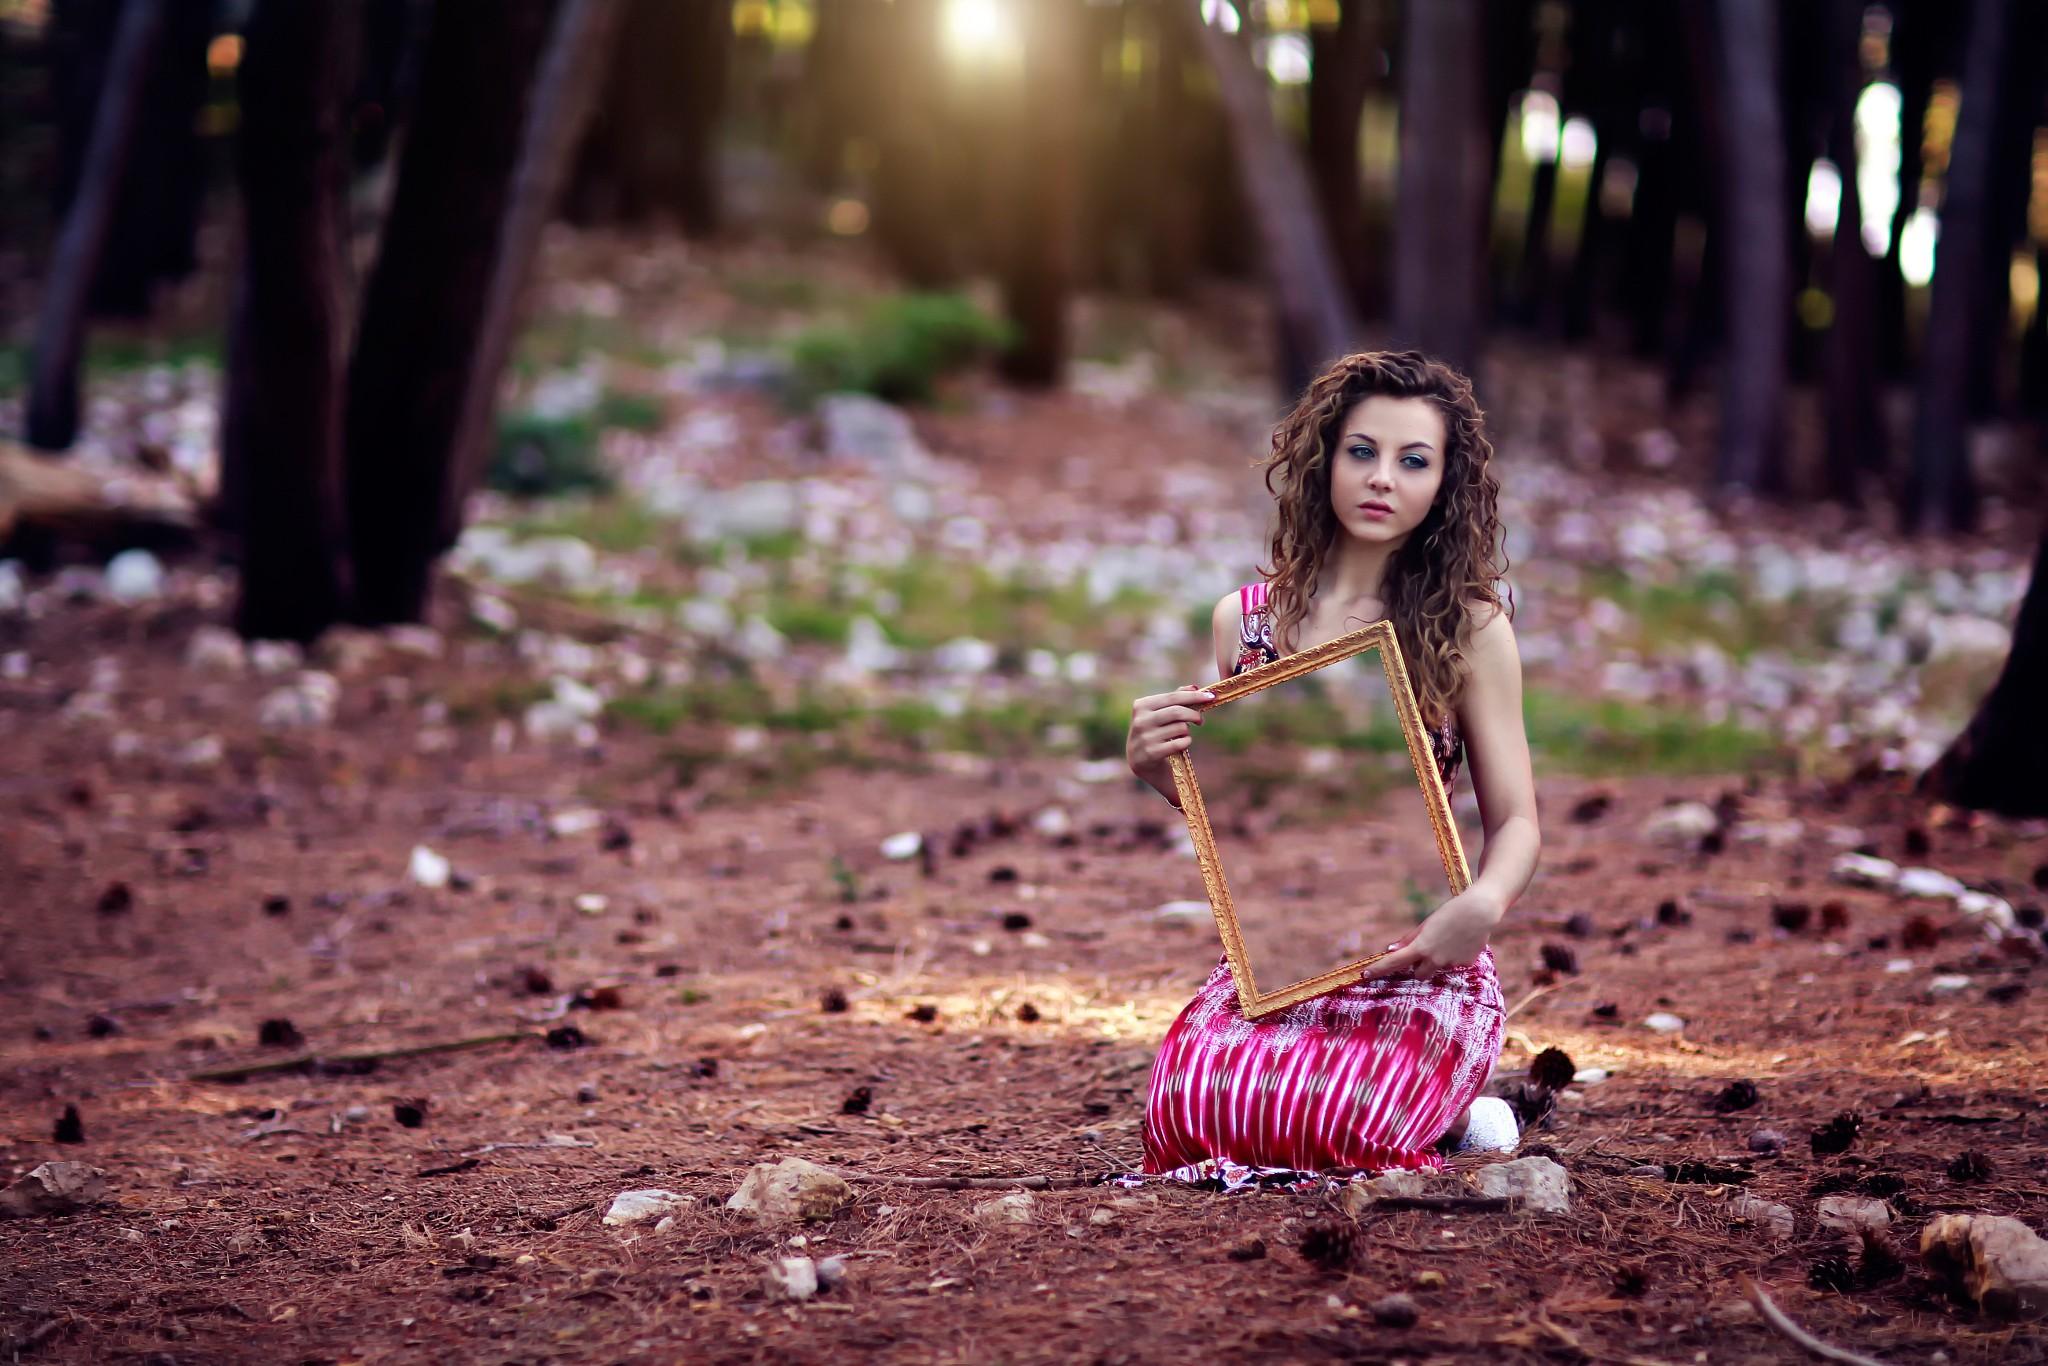 3d Flower Wallpaper For Pc Women Curly Hair Kneel Sitting Bokeh Mirror Ground